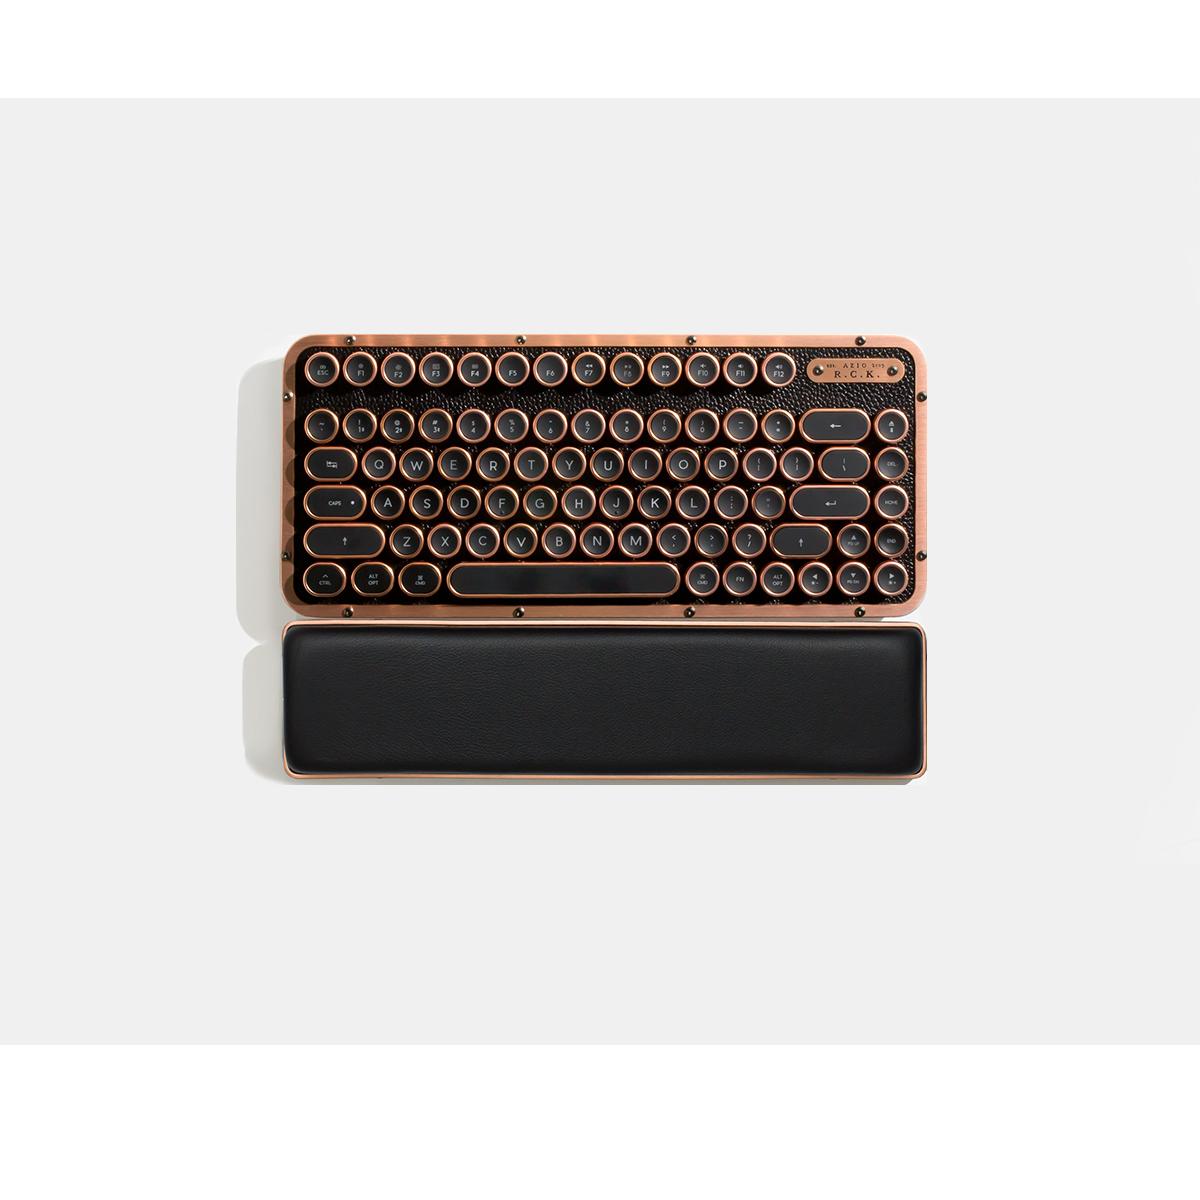 T9 Bluetooth Keyboard